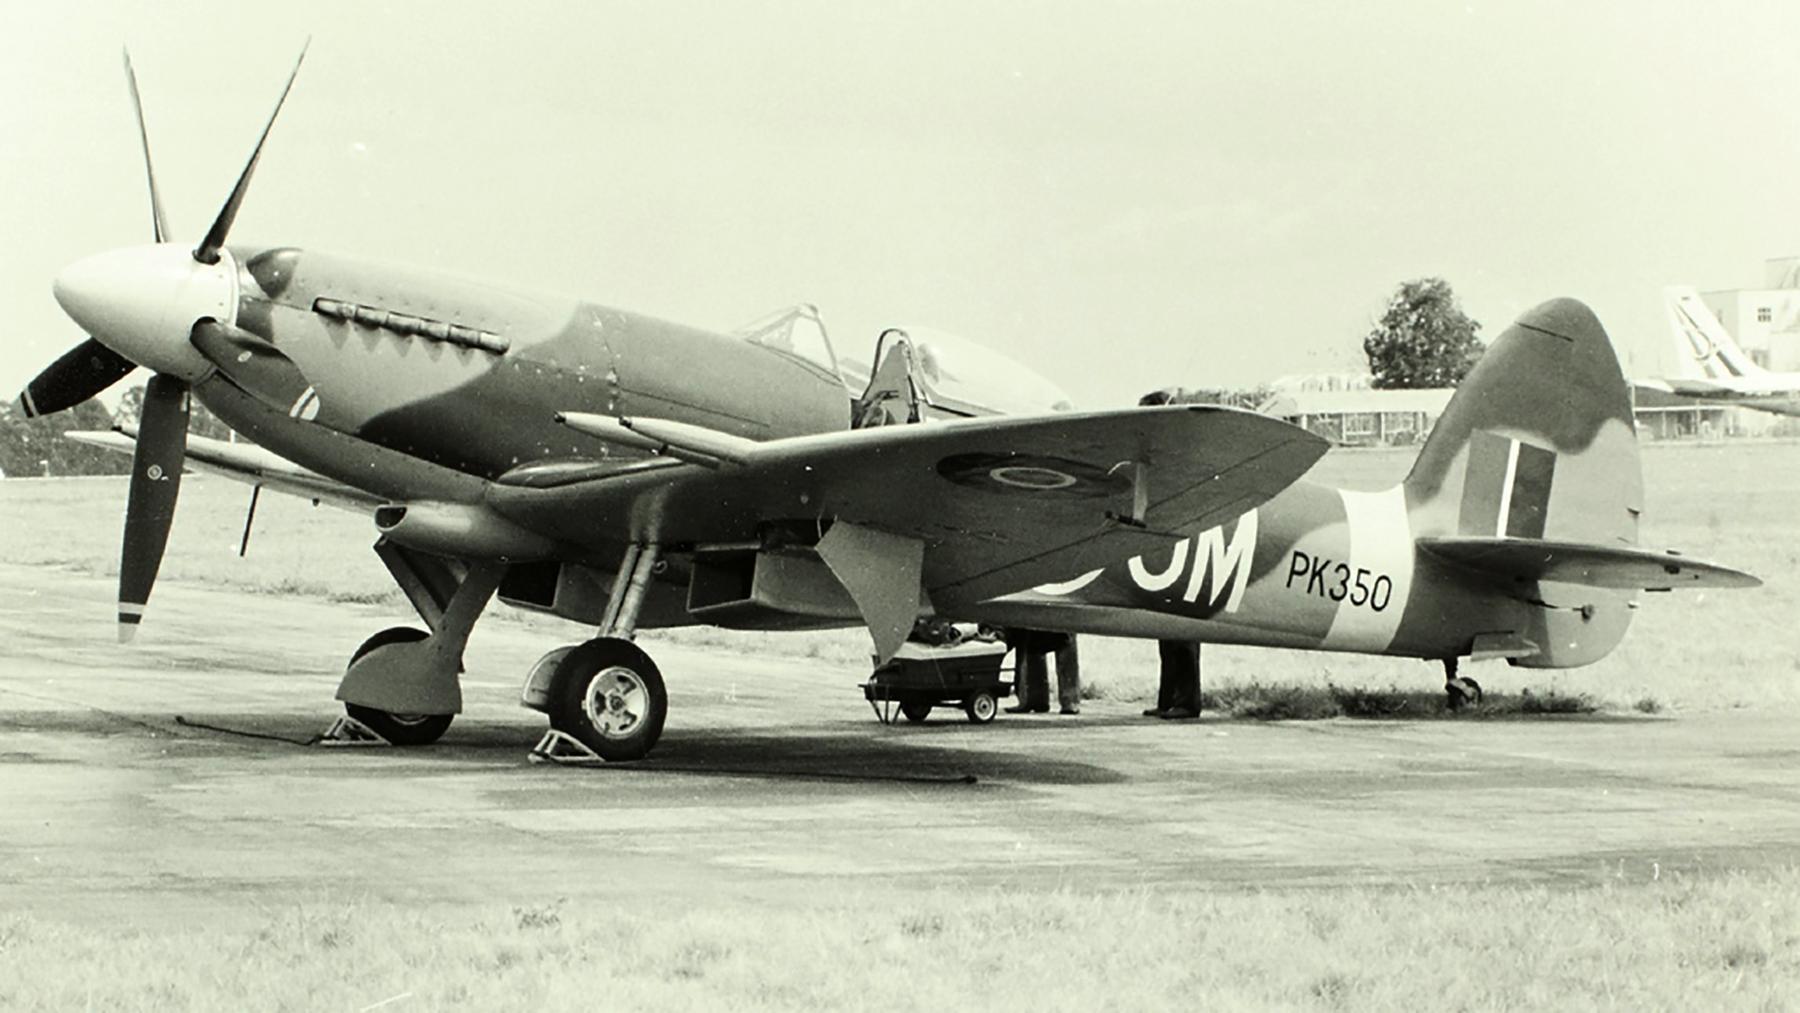 Spitfire F22 RAF JMM PK350 02